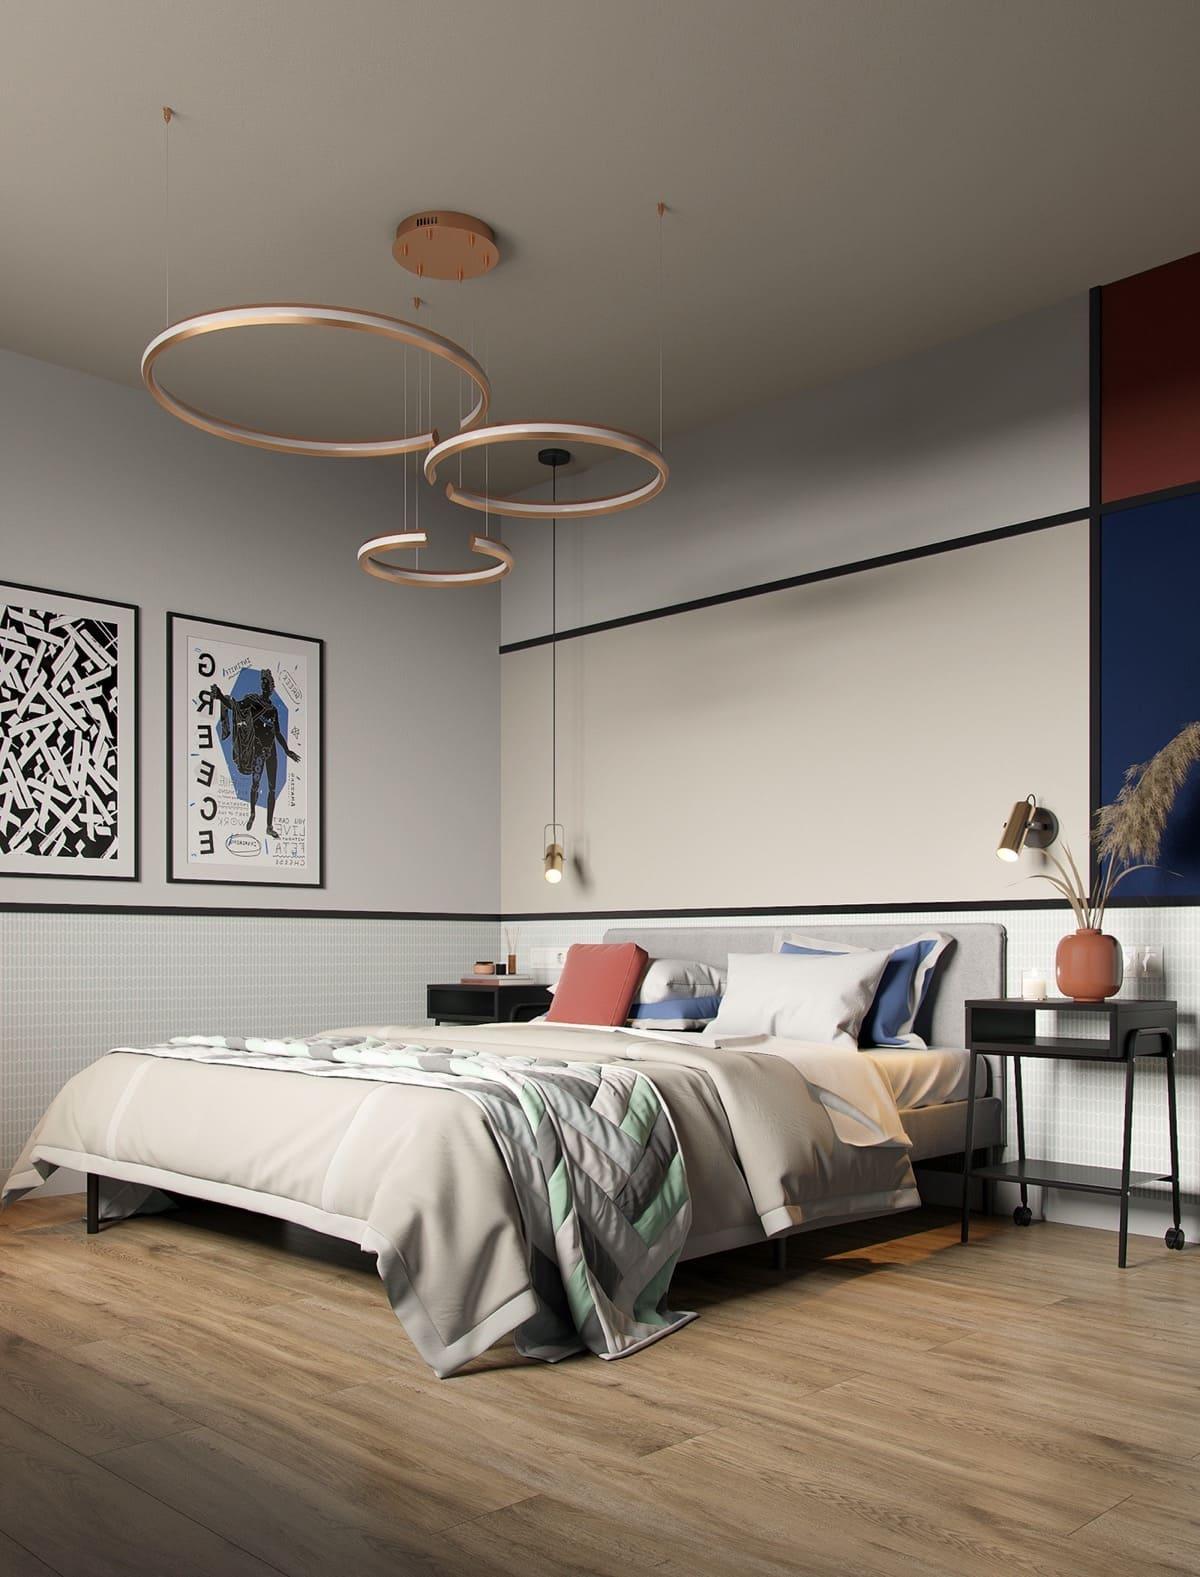 дизайн интерьера модной квартиры фото 58